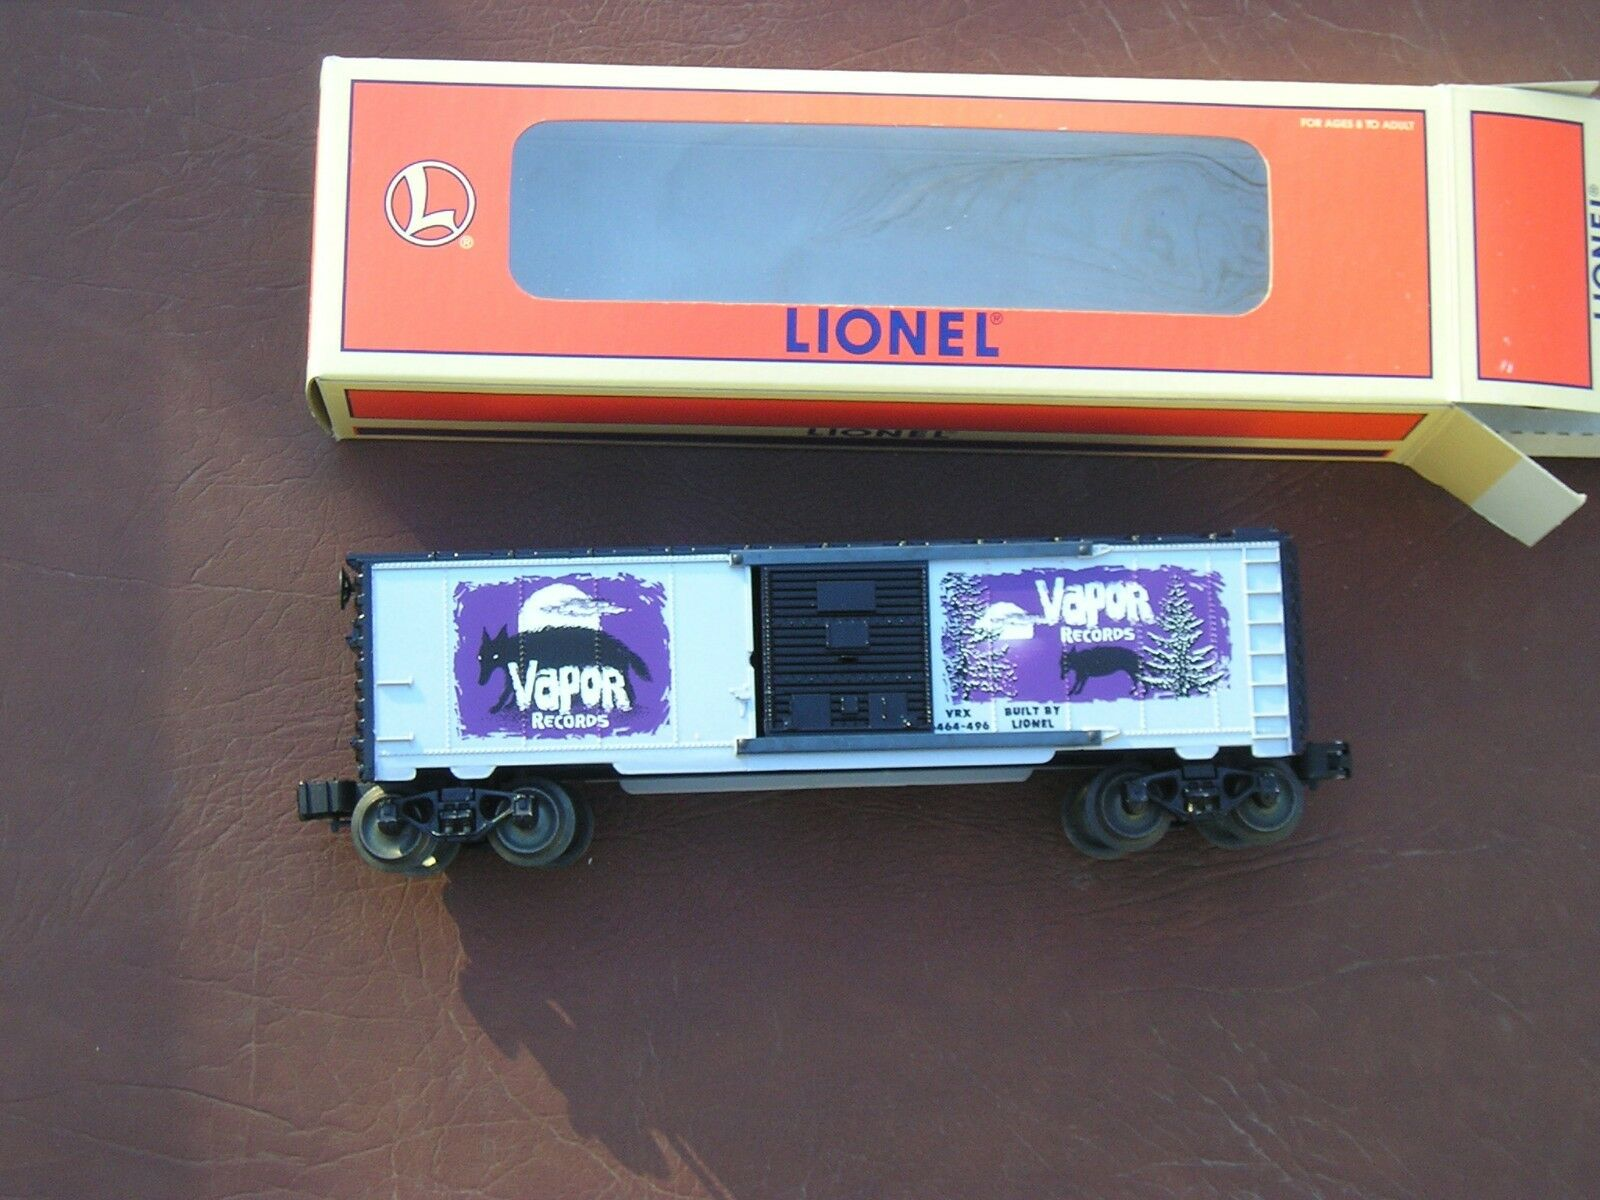 Neil Young Vapor Records scatola auto 629218 Lionel i treni Built 1999